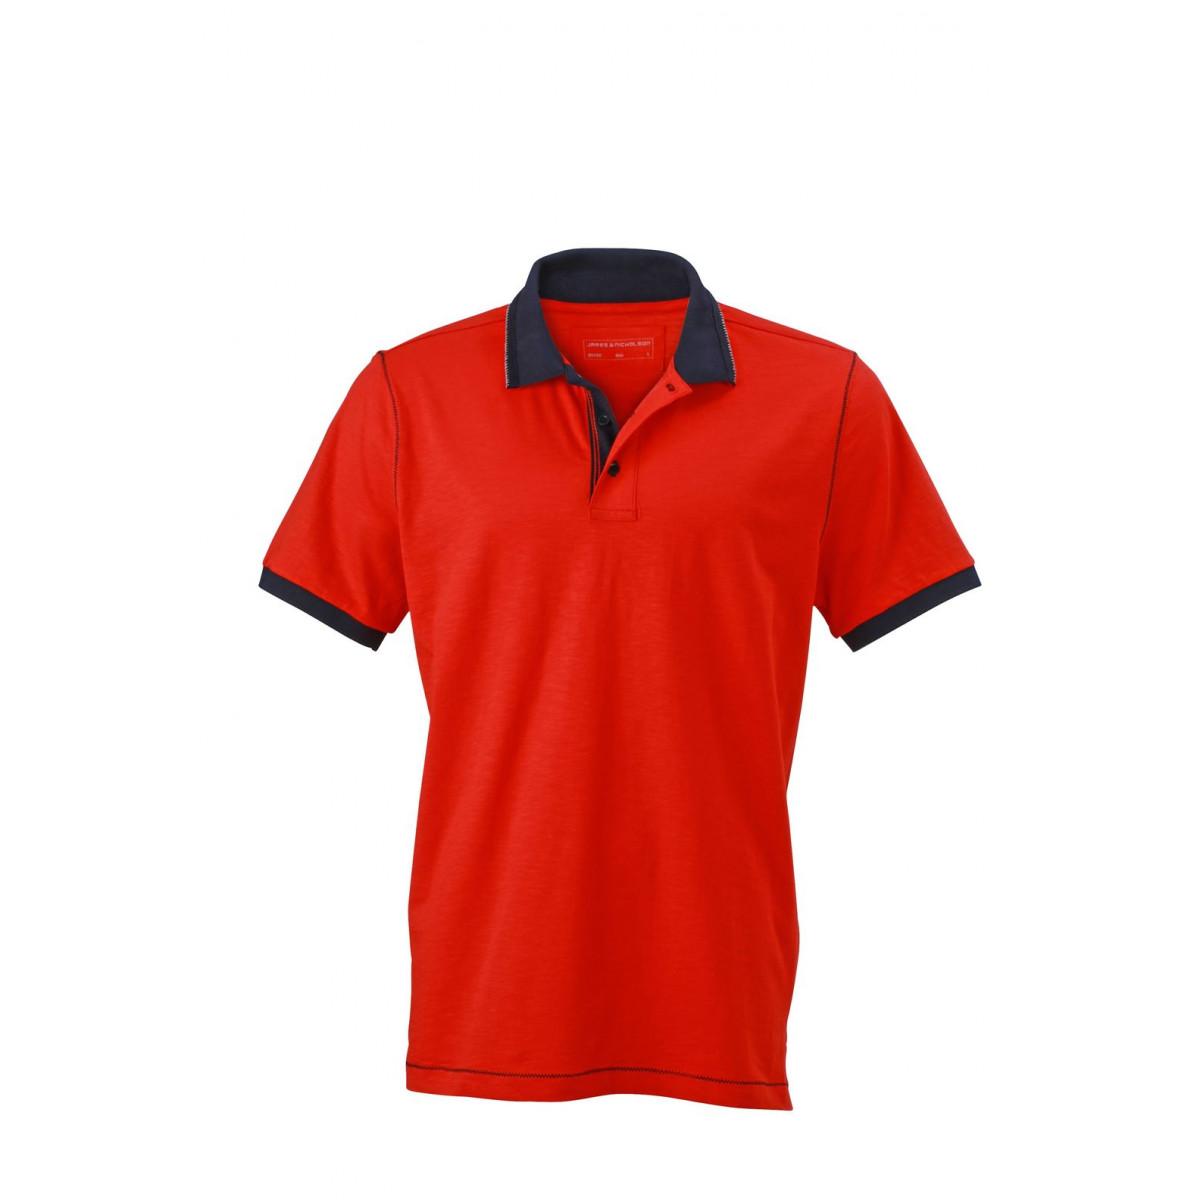 Рубашка поло мужская JN980 Mens Urban Polo - Томатный/Темно-синий